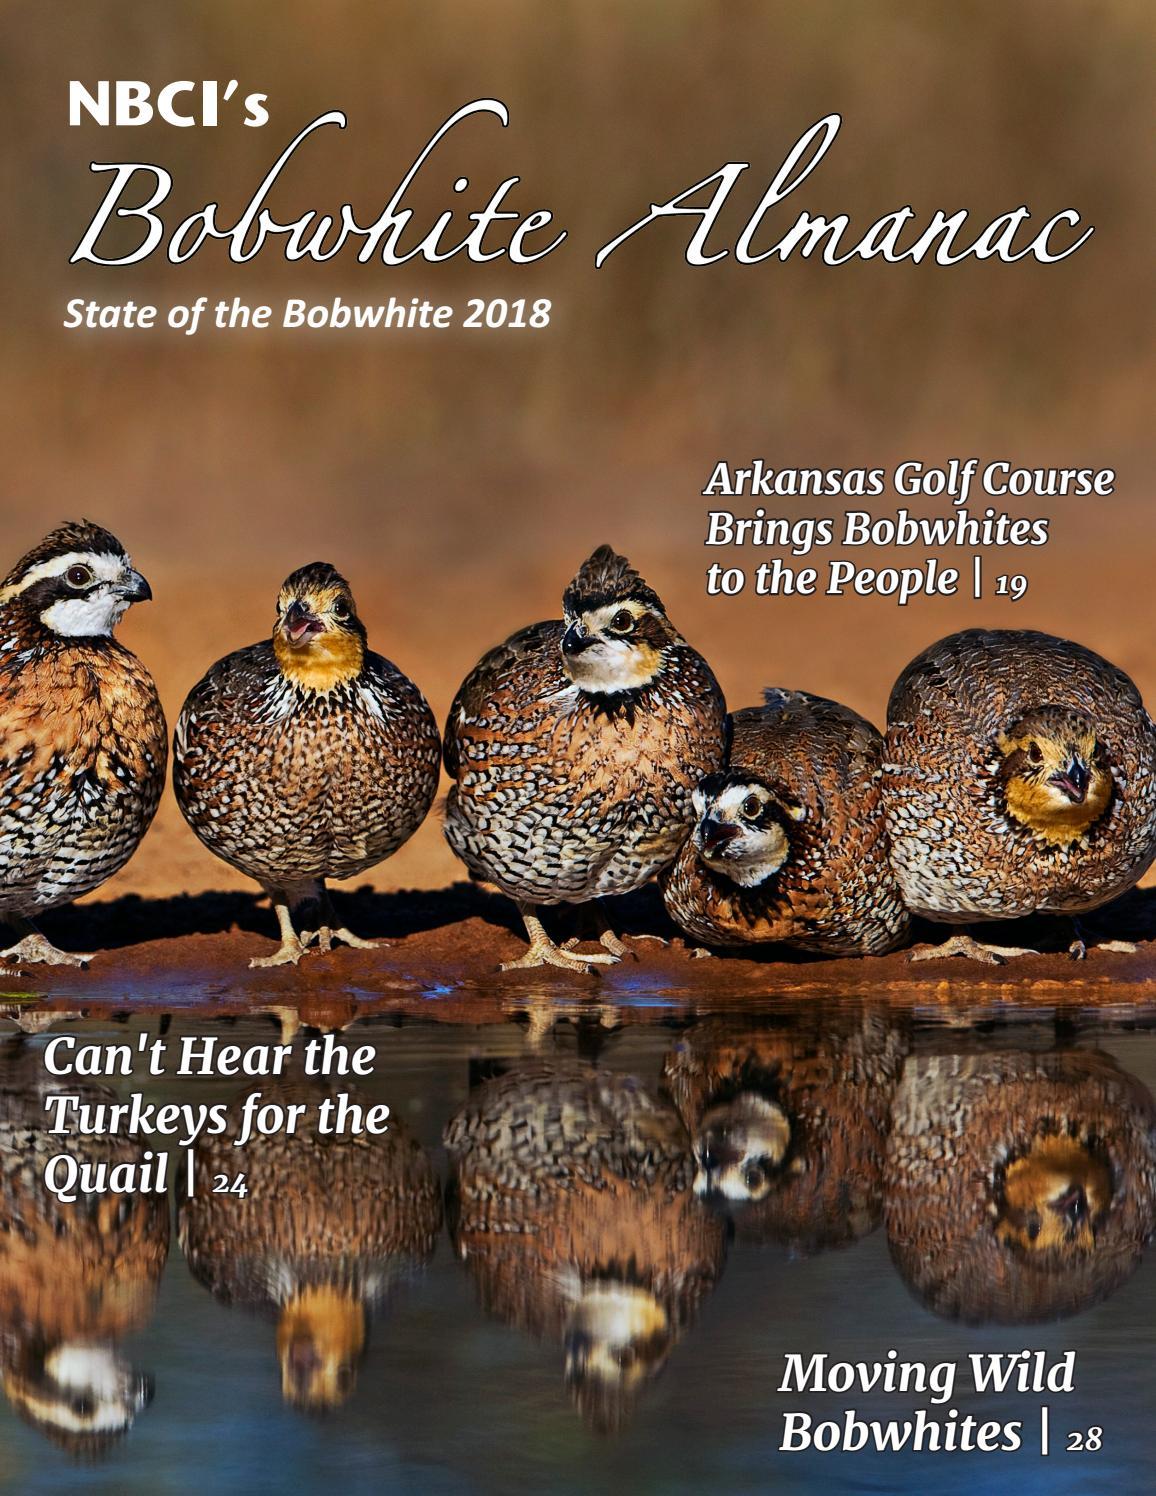 NBCI's Bobwhite Almanac, State of the Bobwhite 2018 by